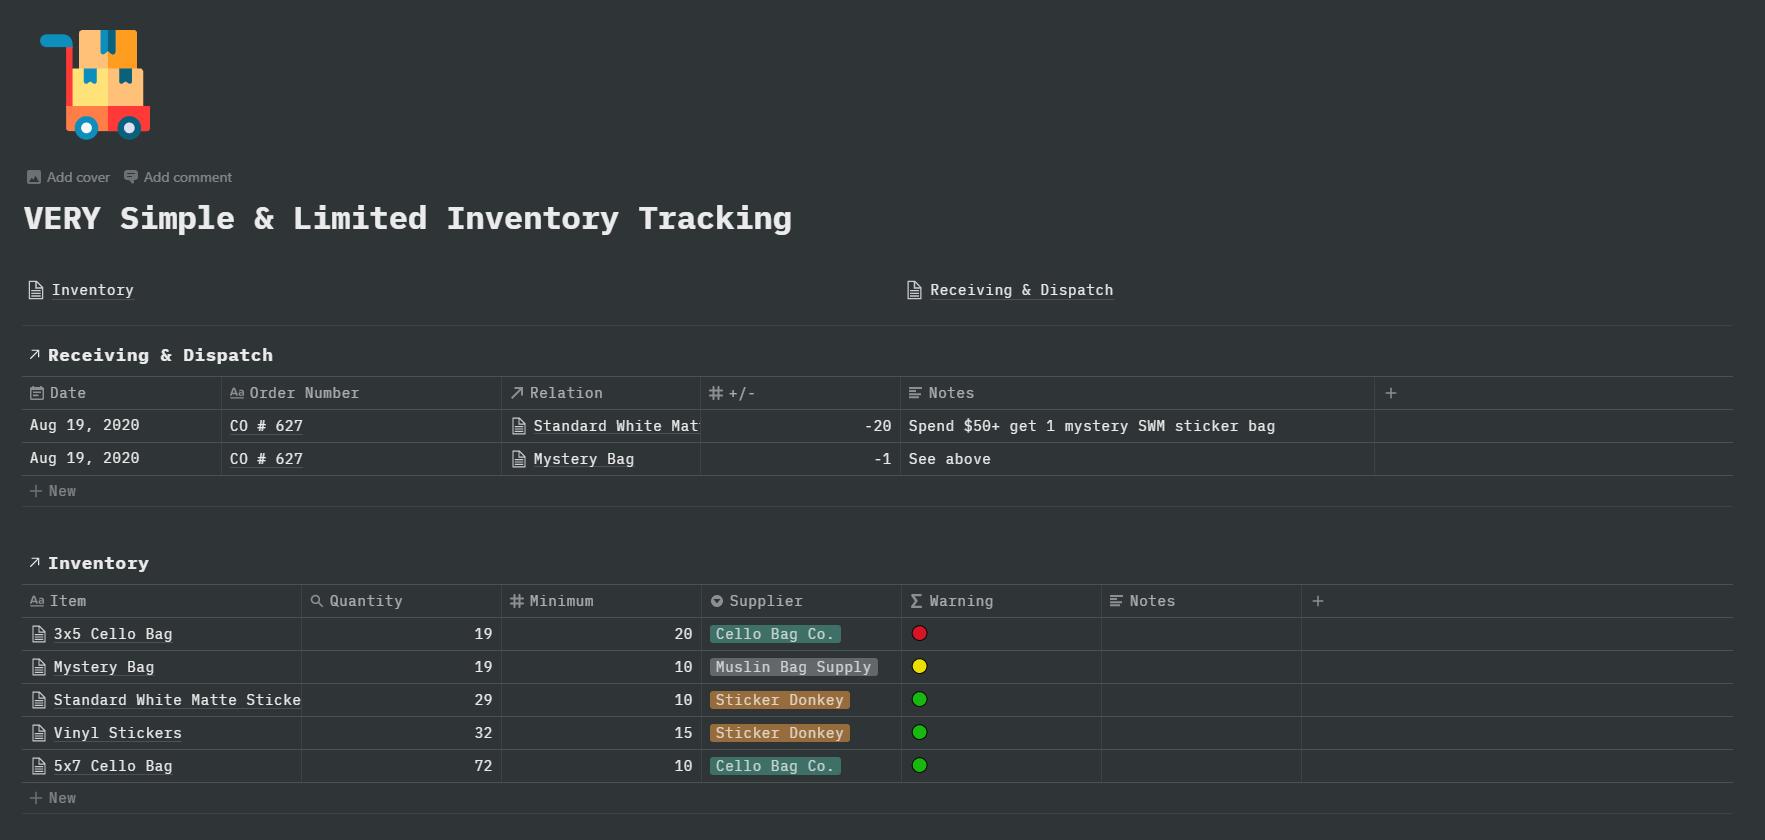 Super simple inventory management